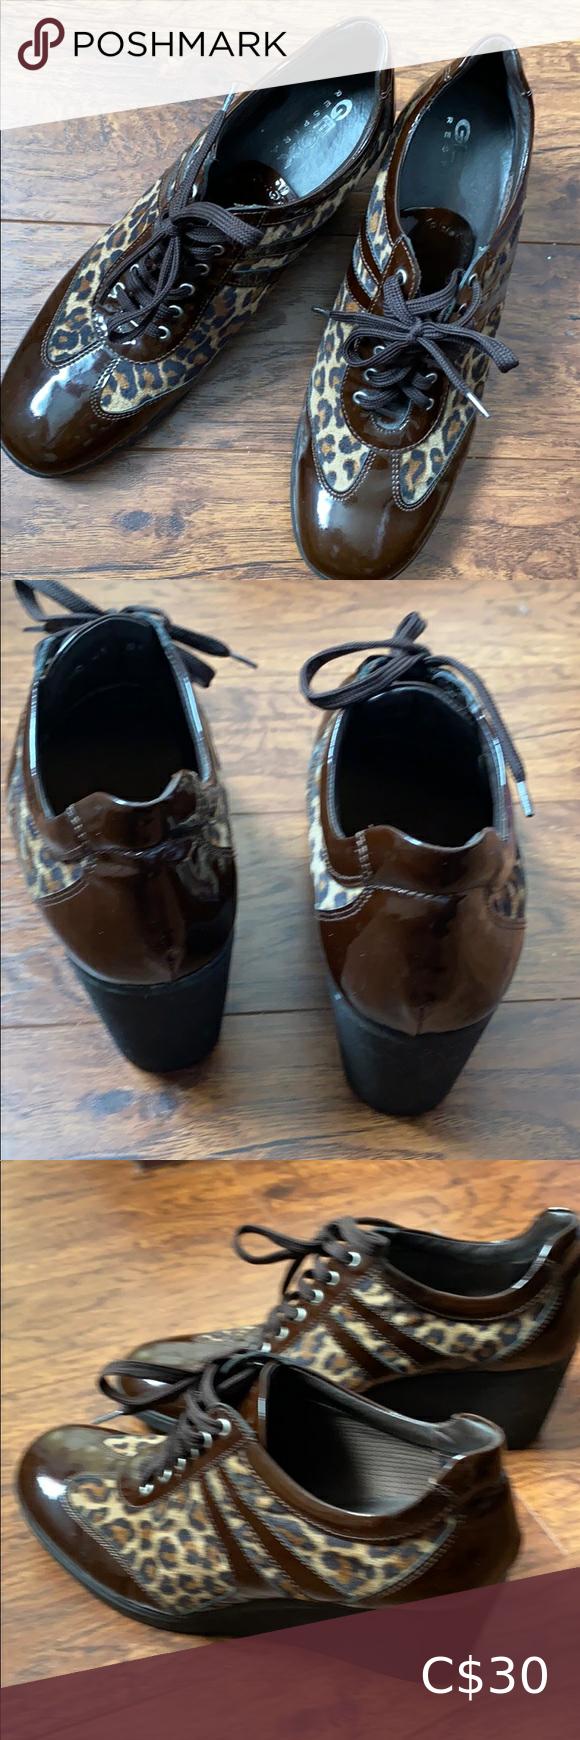 geox leopard print shoes